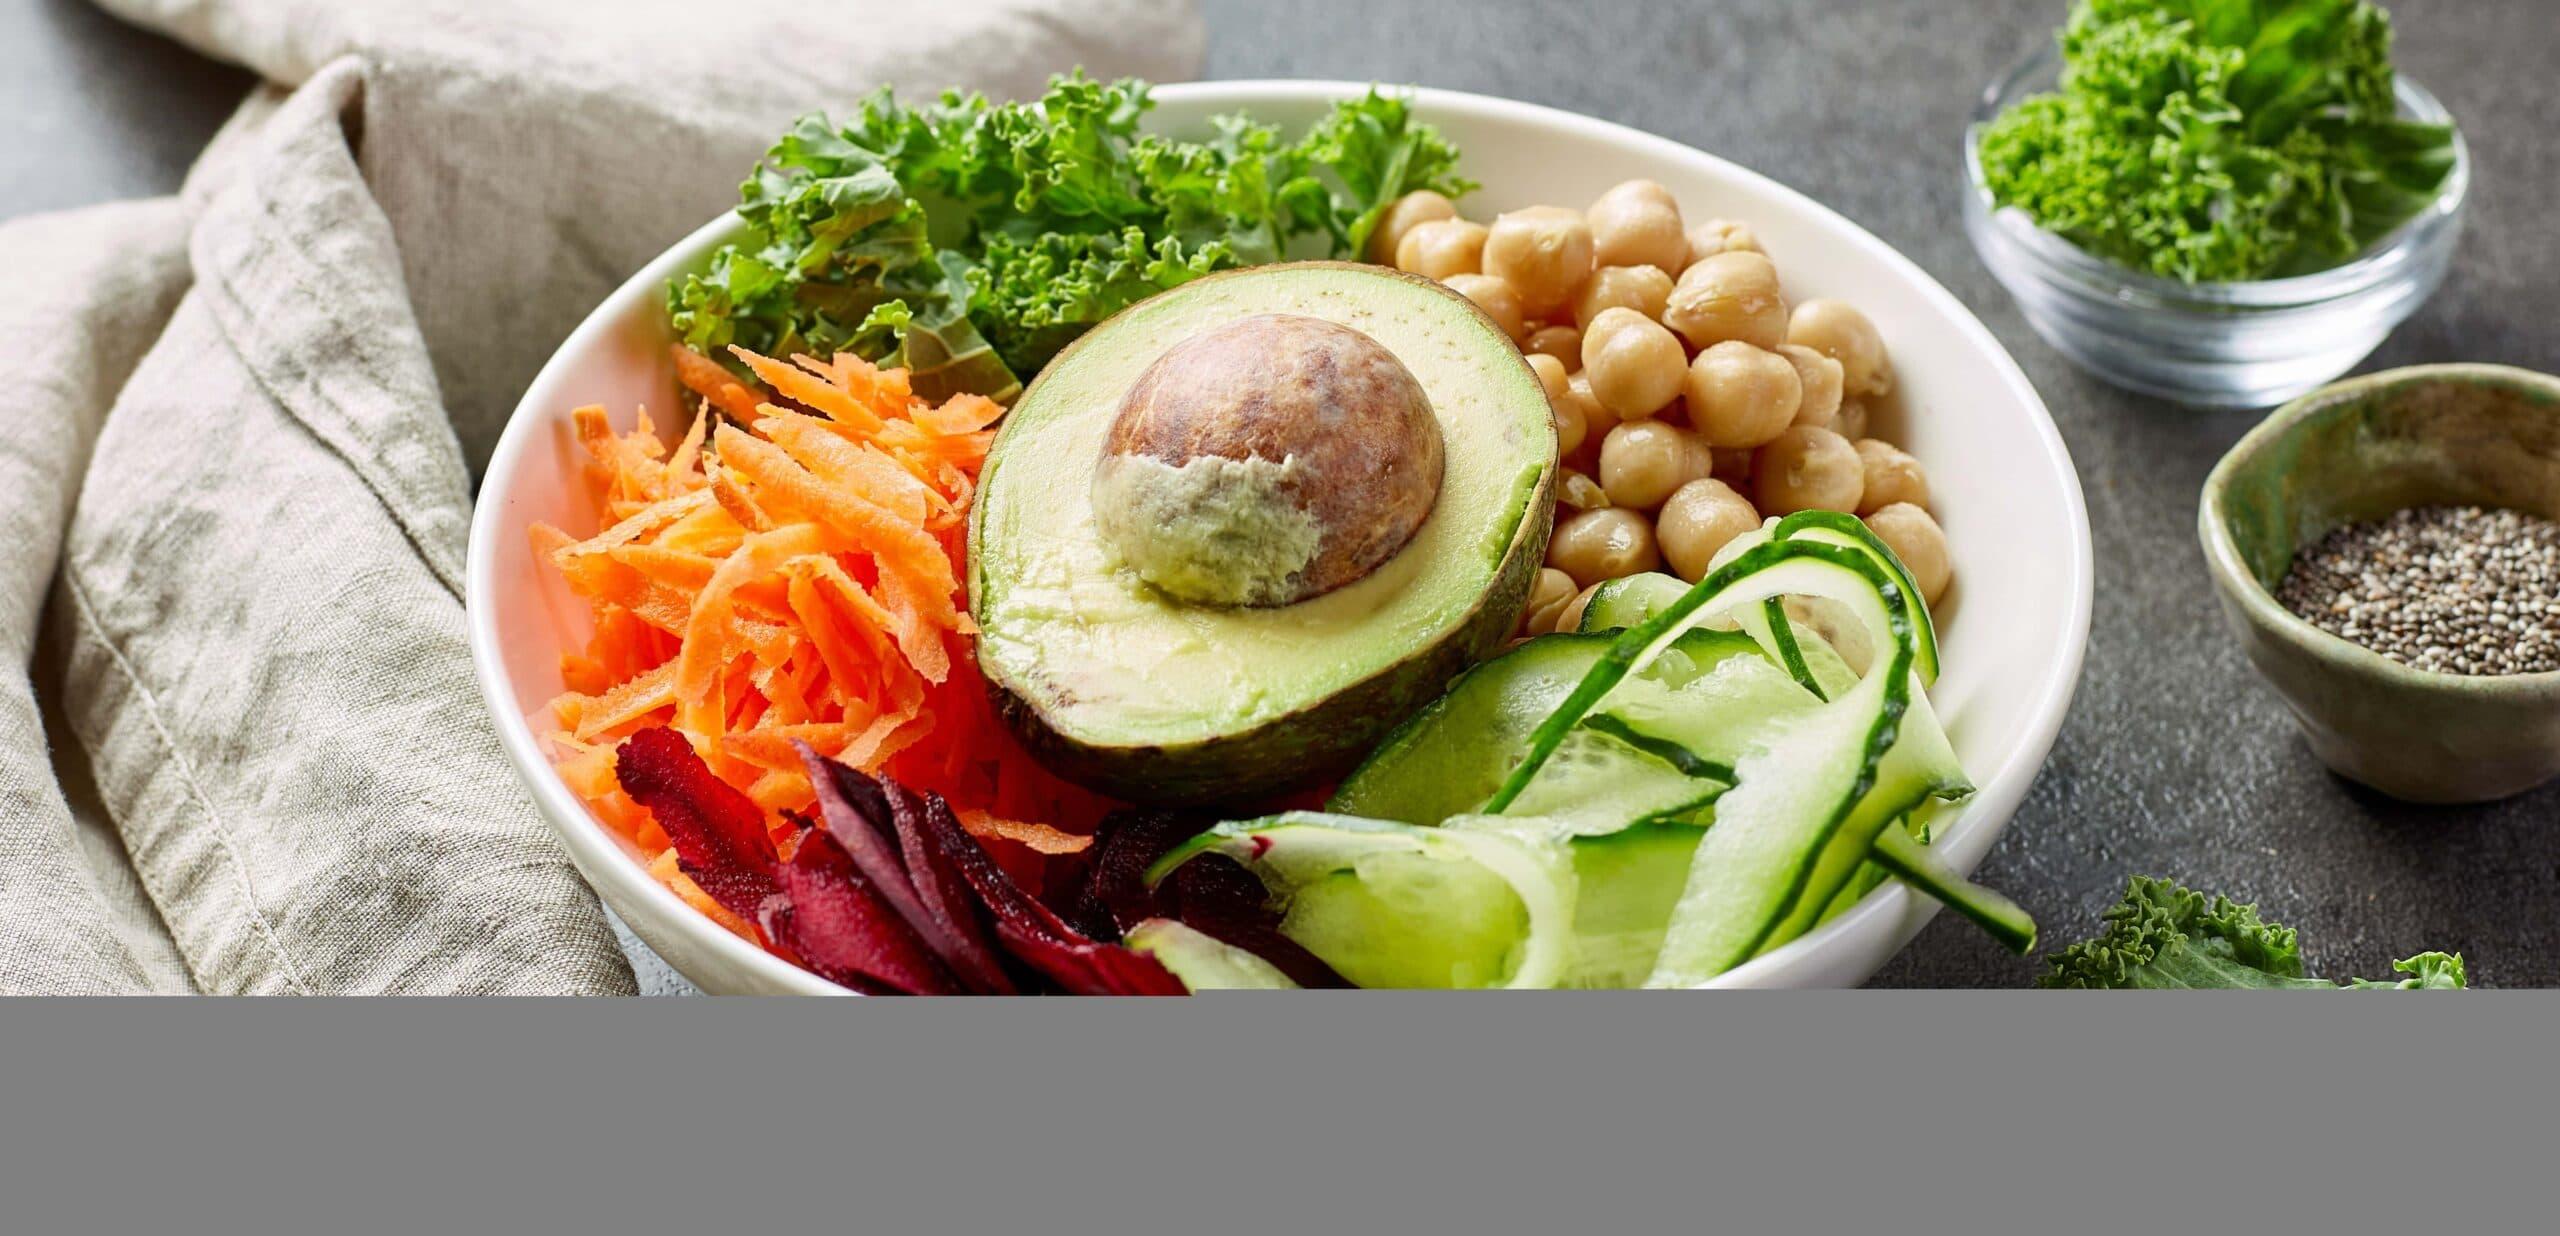 fonti alimentari proteine vegane per la palestra